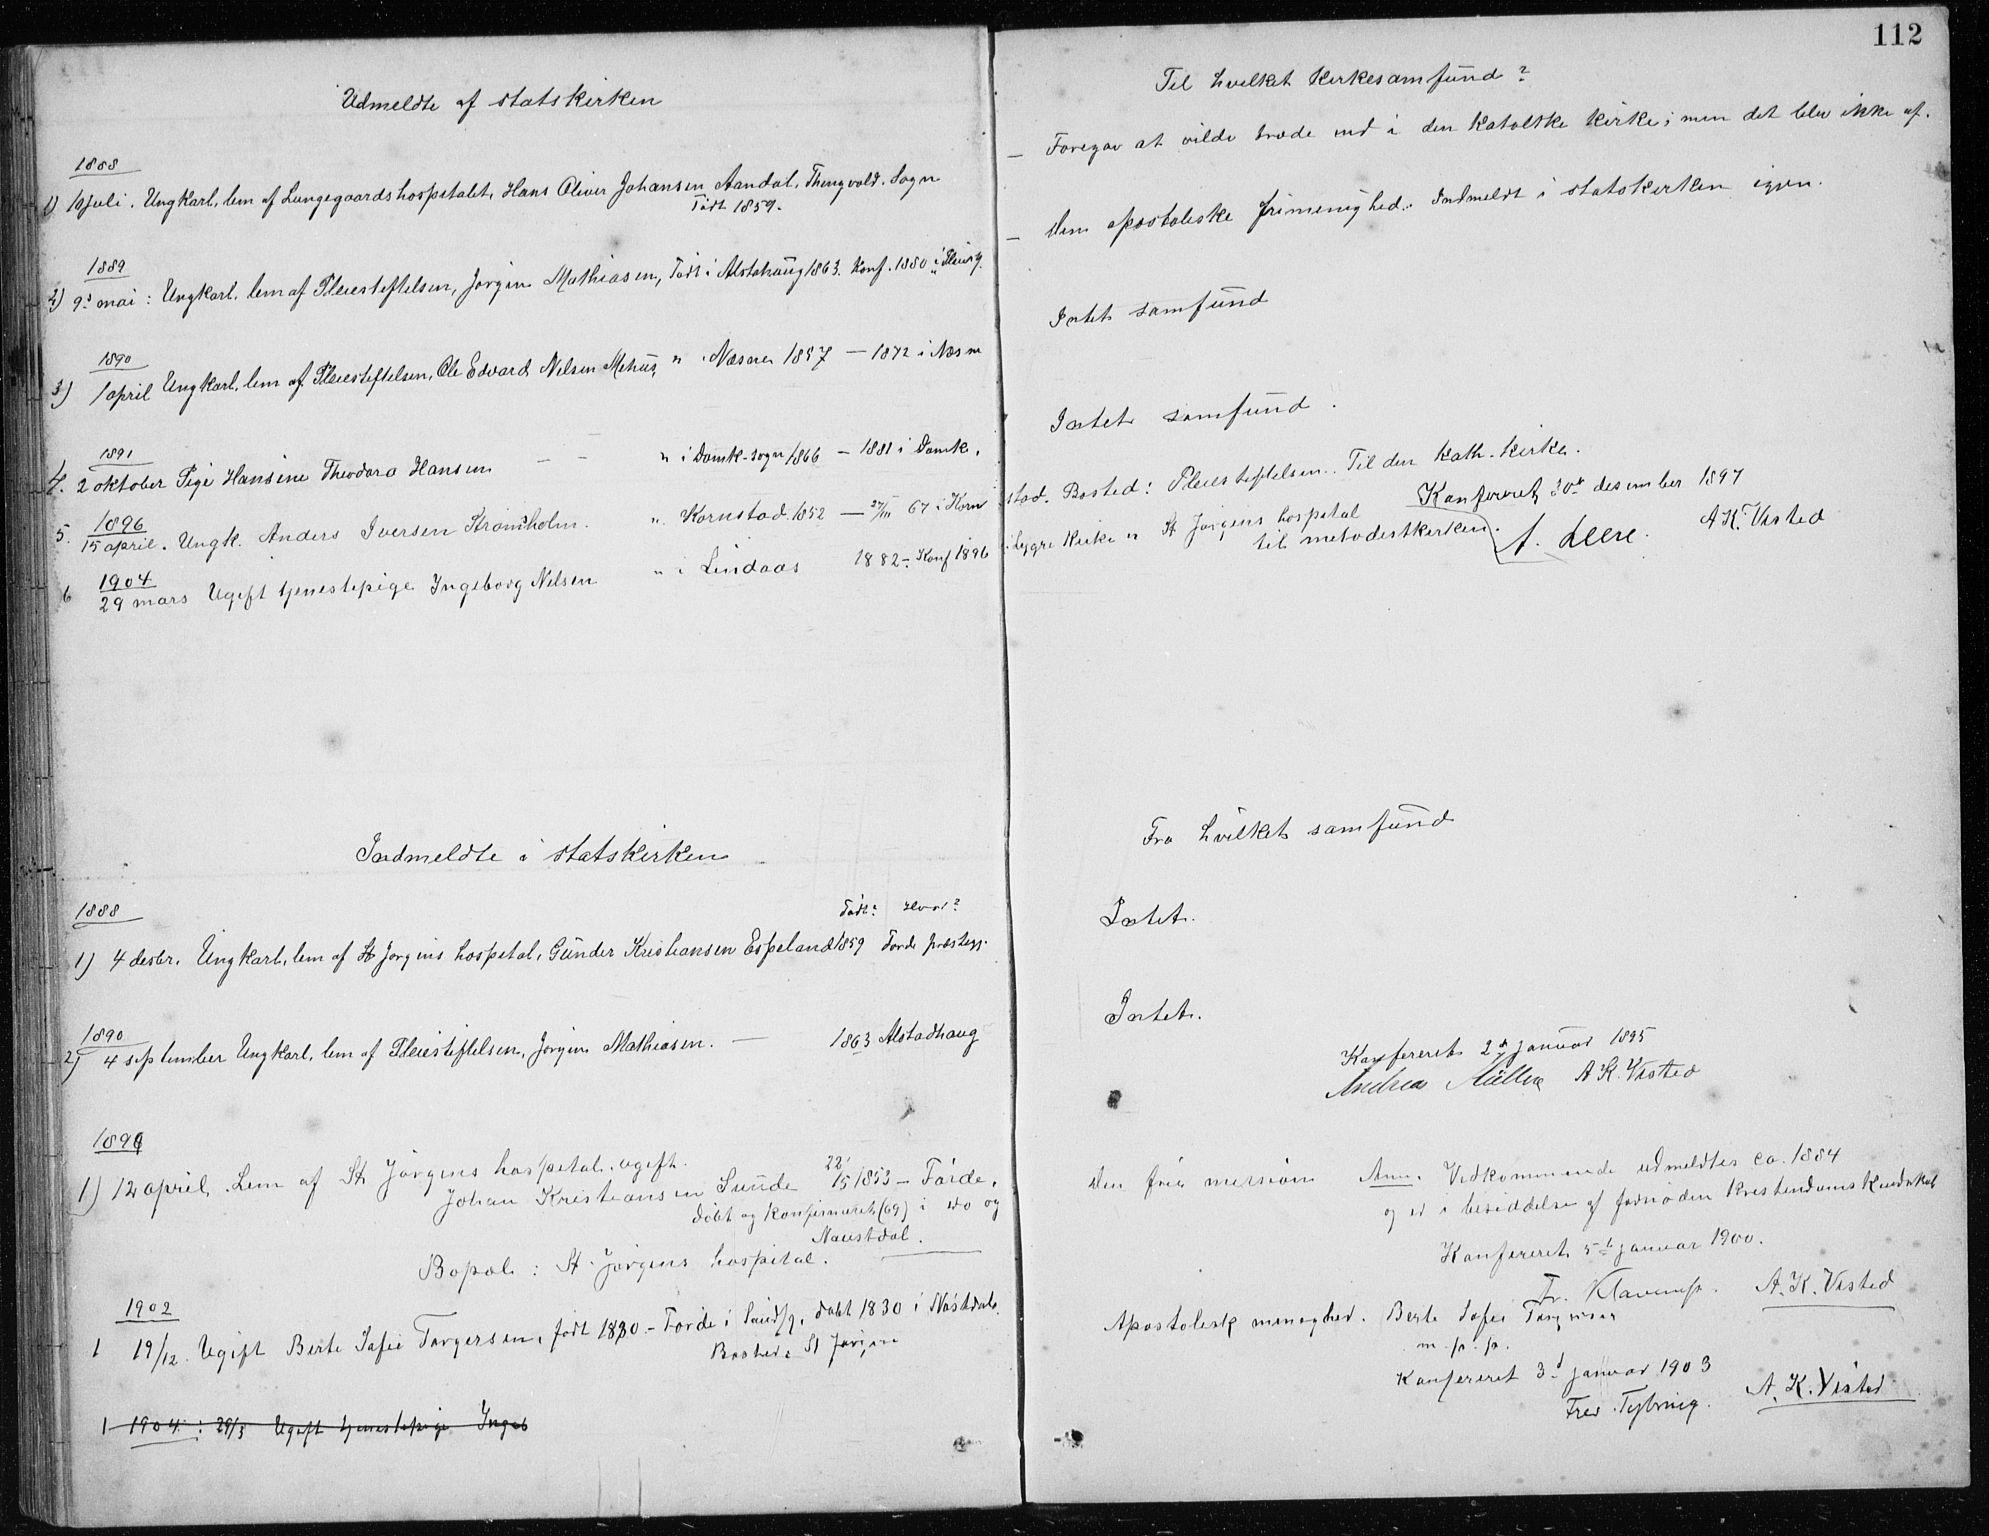 SAB, St. Jørgens hospital og Årstad sokneprestembete, Klokkerbok nr. A 10, 1886-1910, s. 112